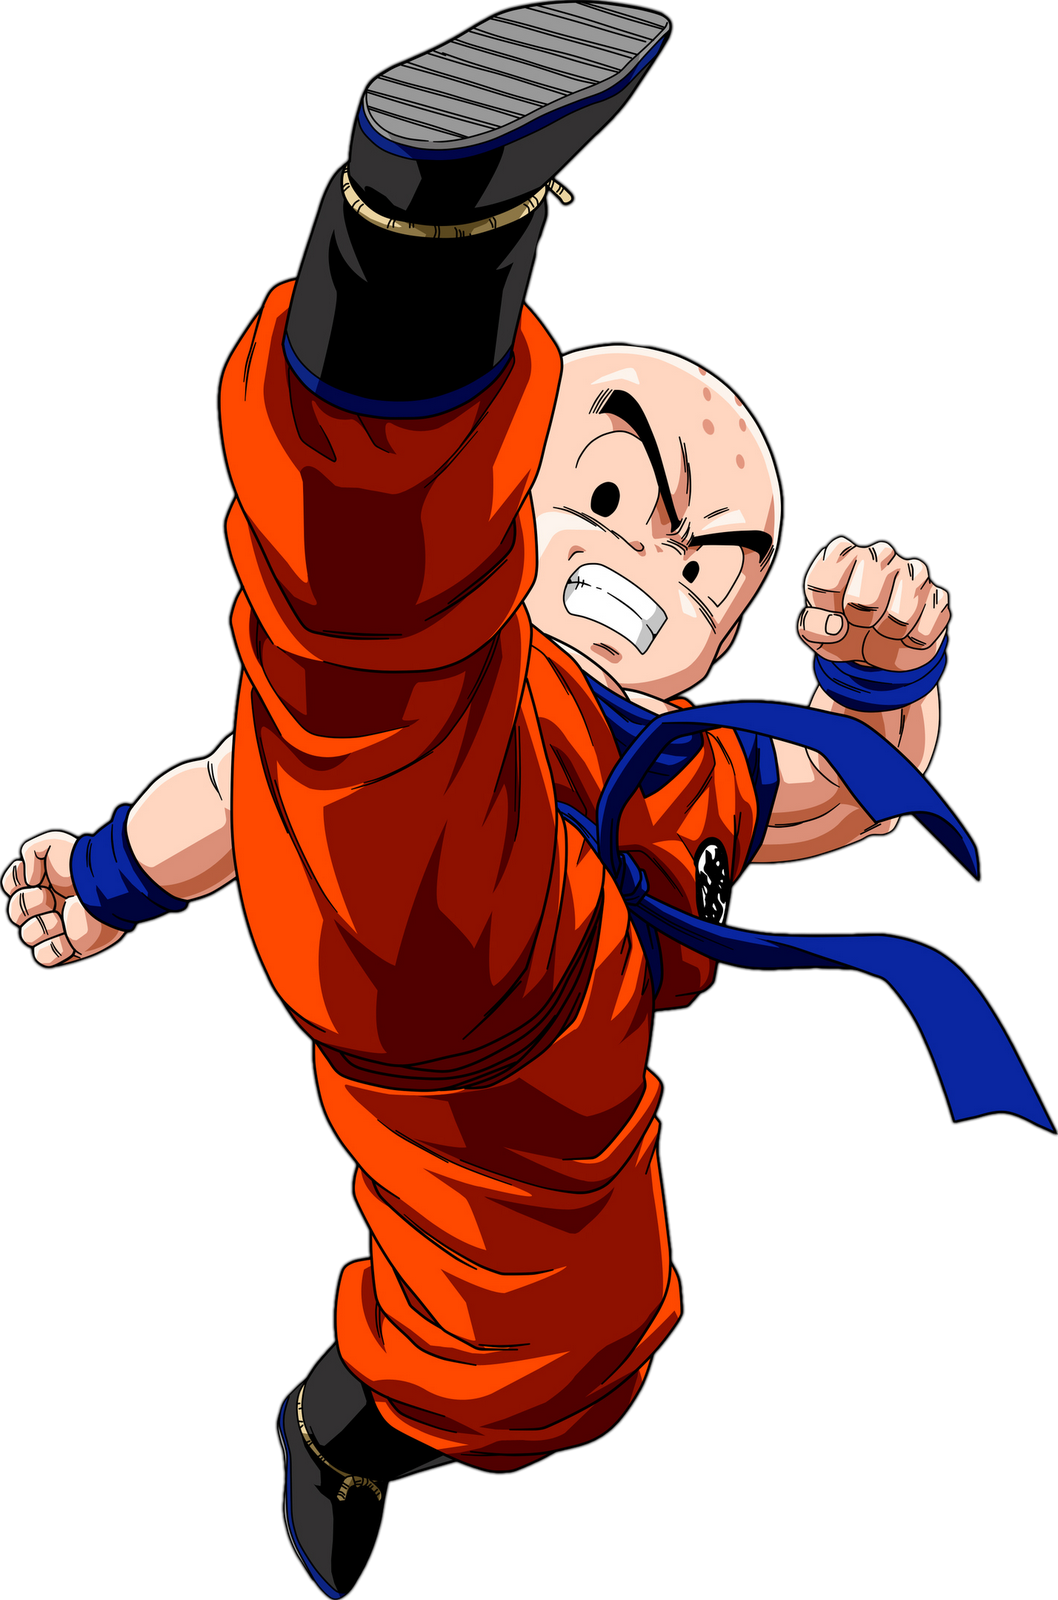 Download Image Render Dragon Ball Png Wiki Fandom Dragon Ball Z